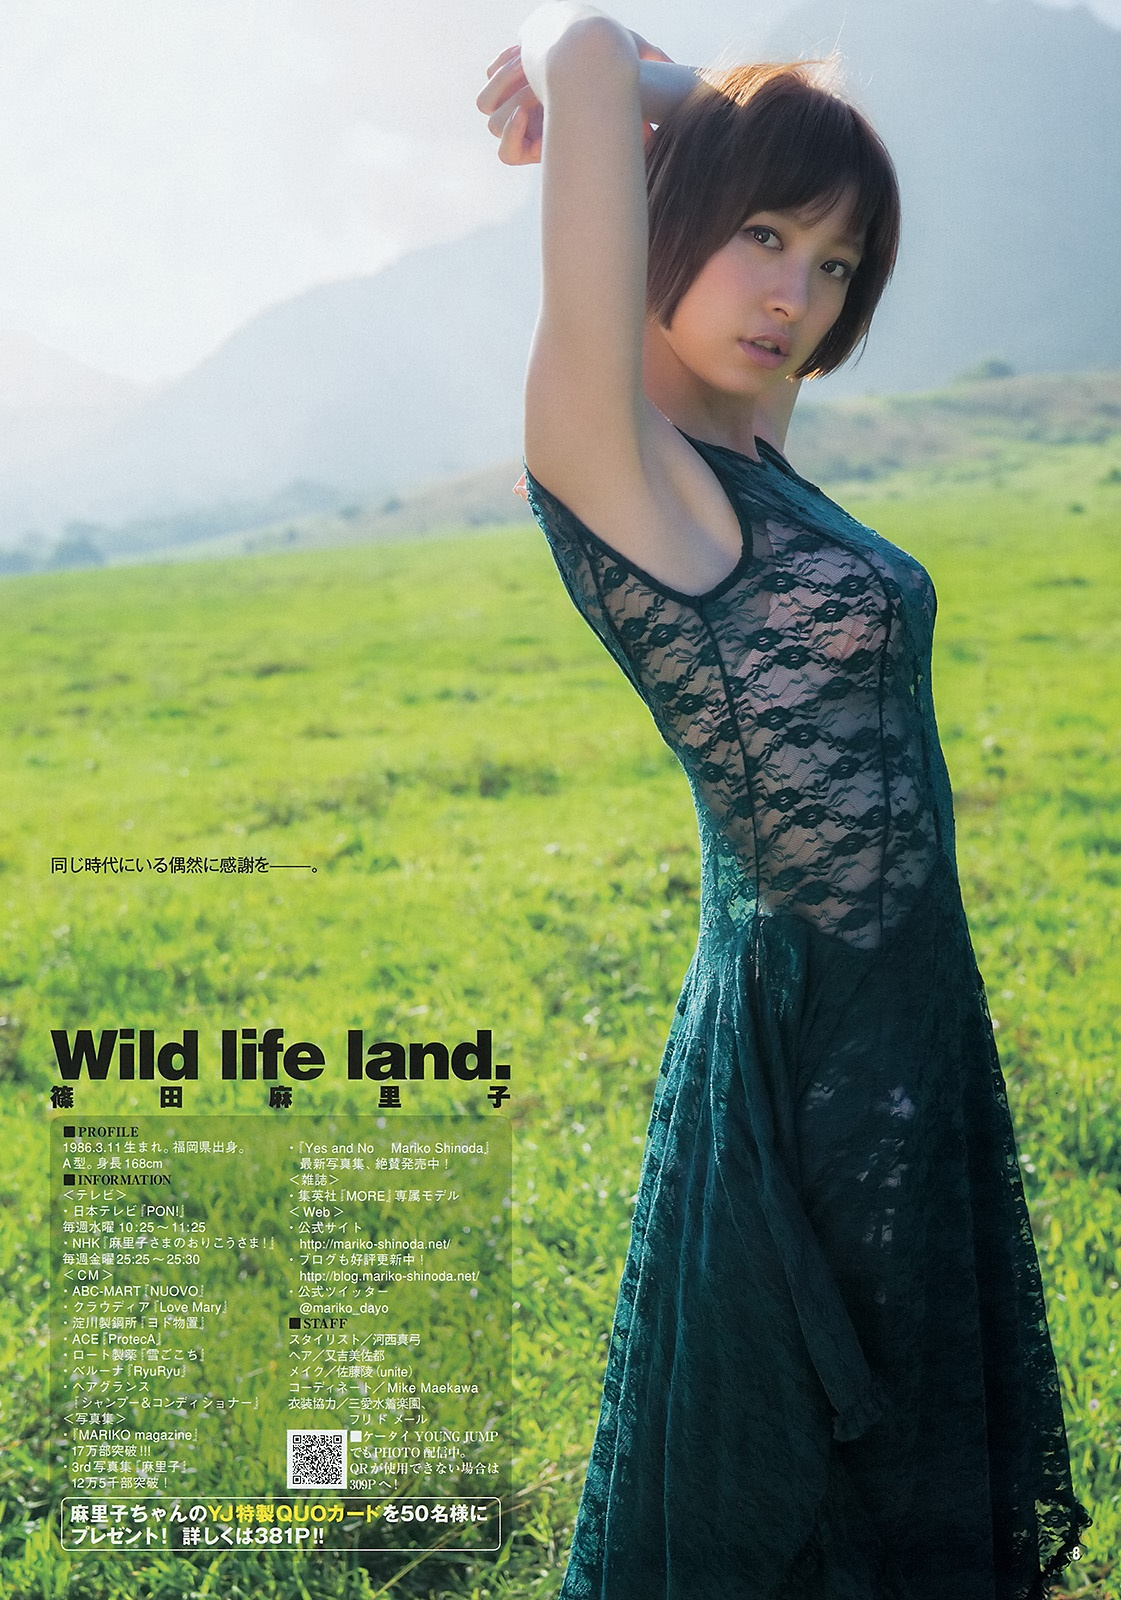 Mariko Shinoda Android Iphone Wallpaper 38492 Asiachan